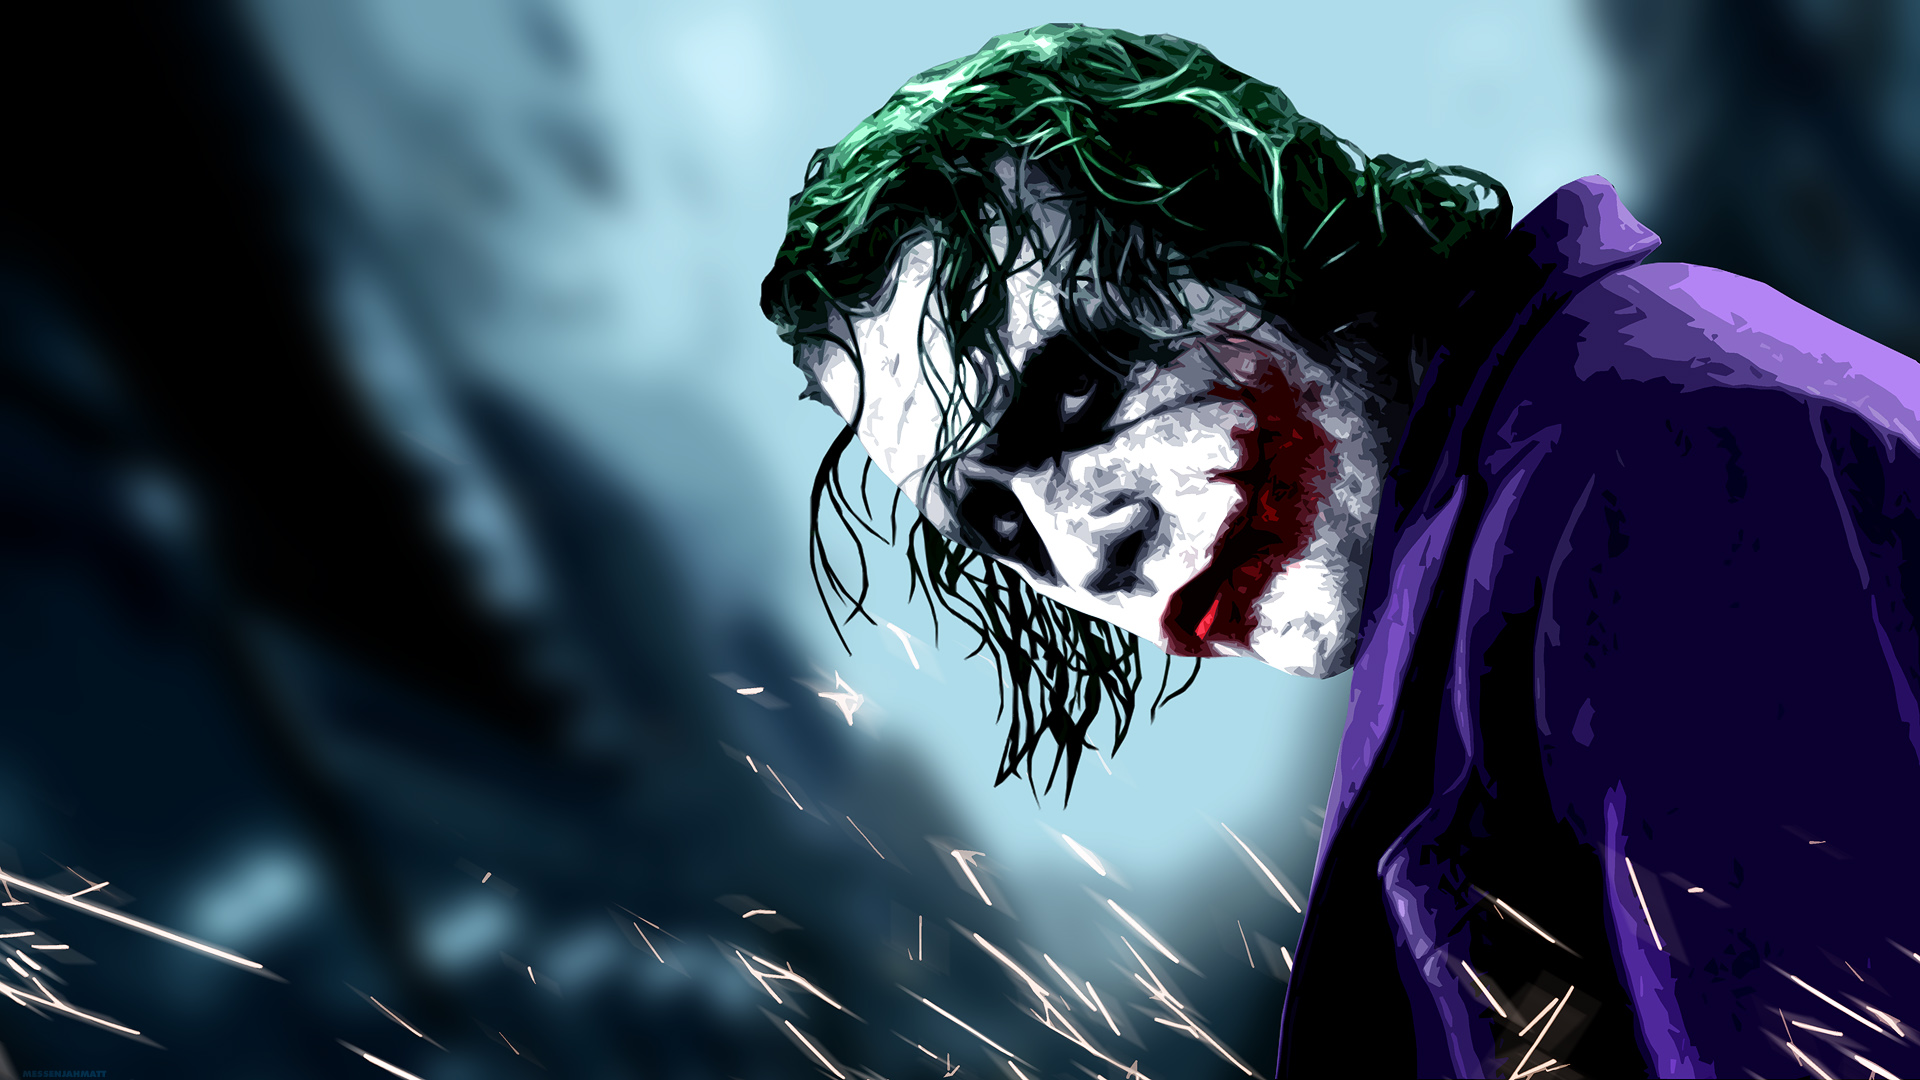 Joker HD Wallpaper Joker Pictures Cool Wallpapers 1920x1080